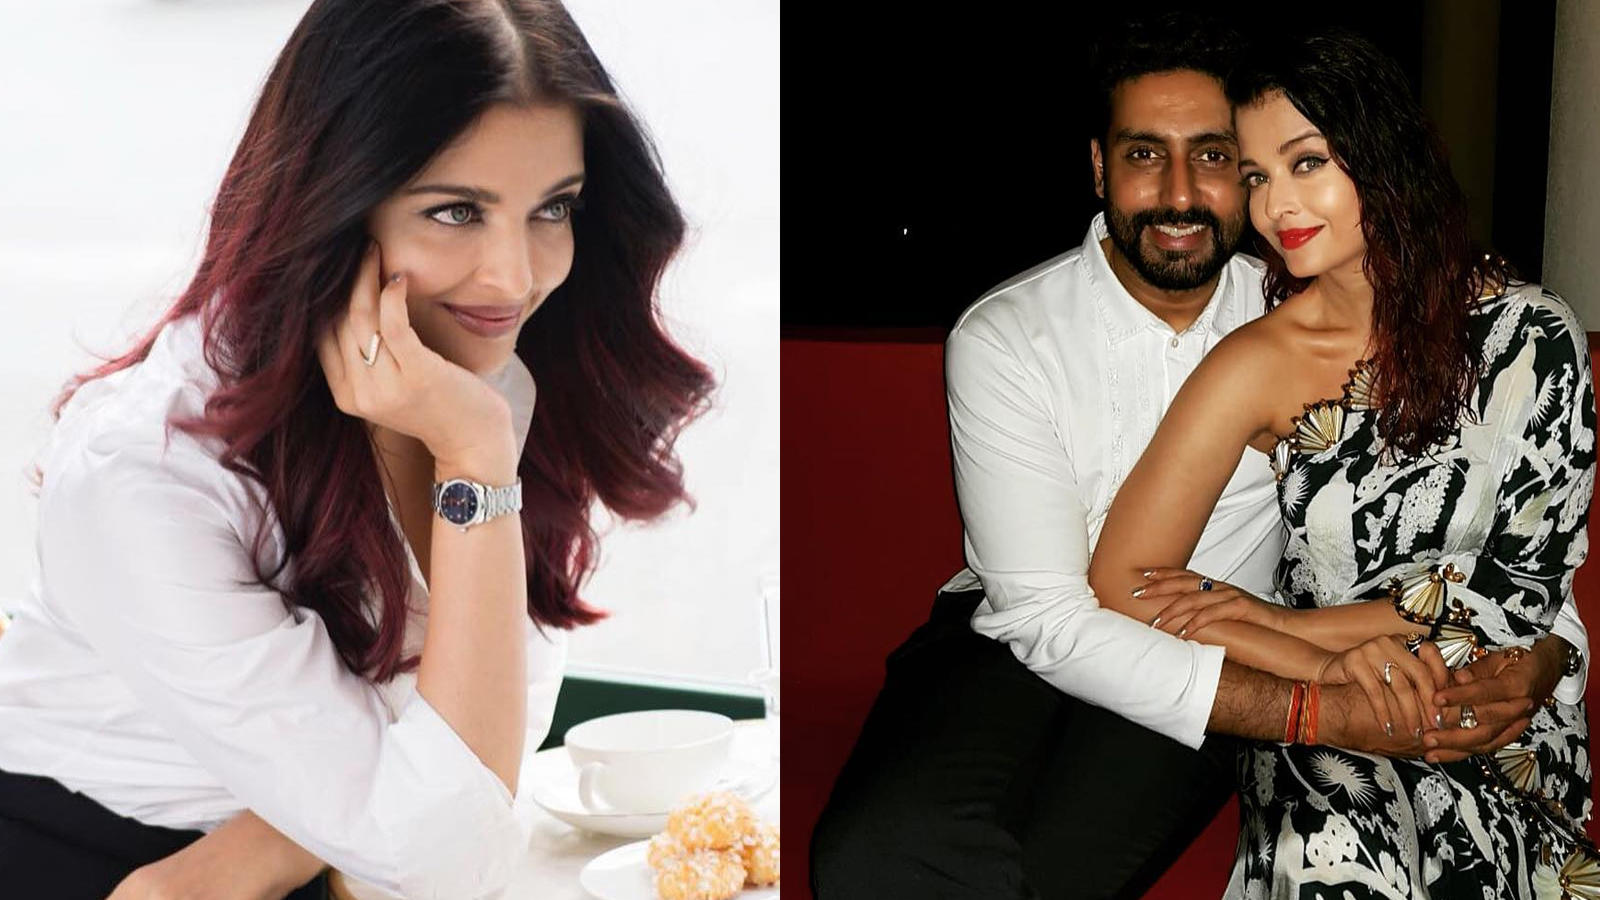 Aishwarya Rai Bachchan recalls how Abhishek Bachchan proposed to her